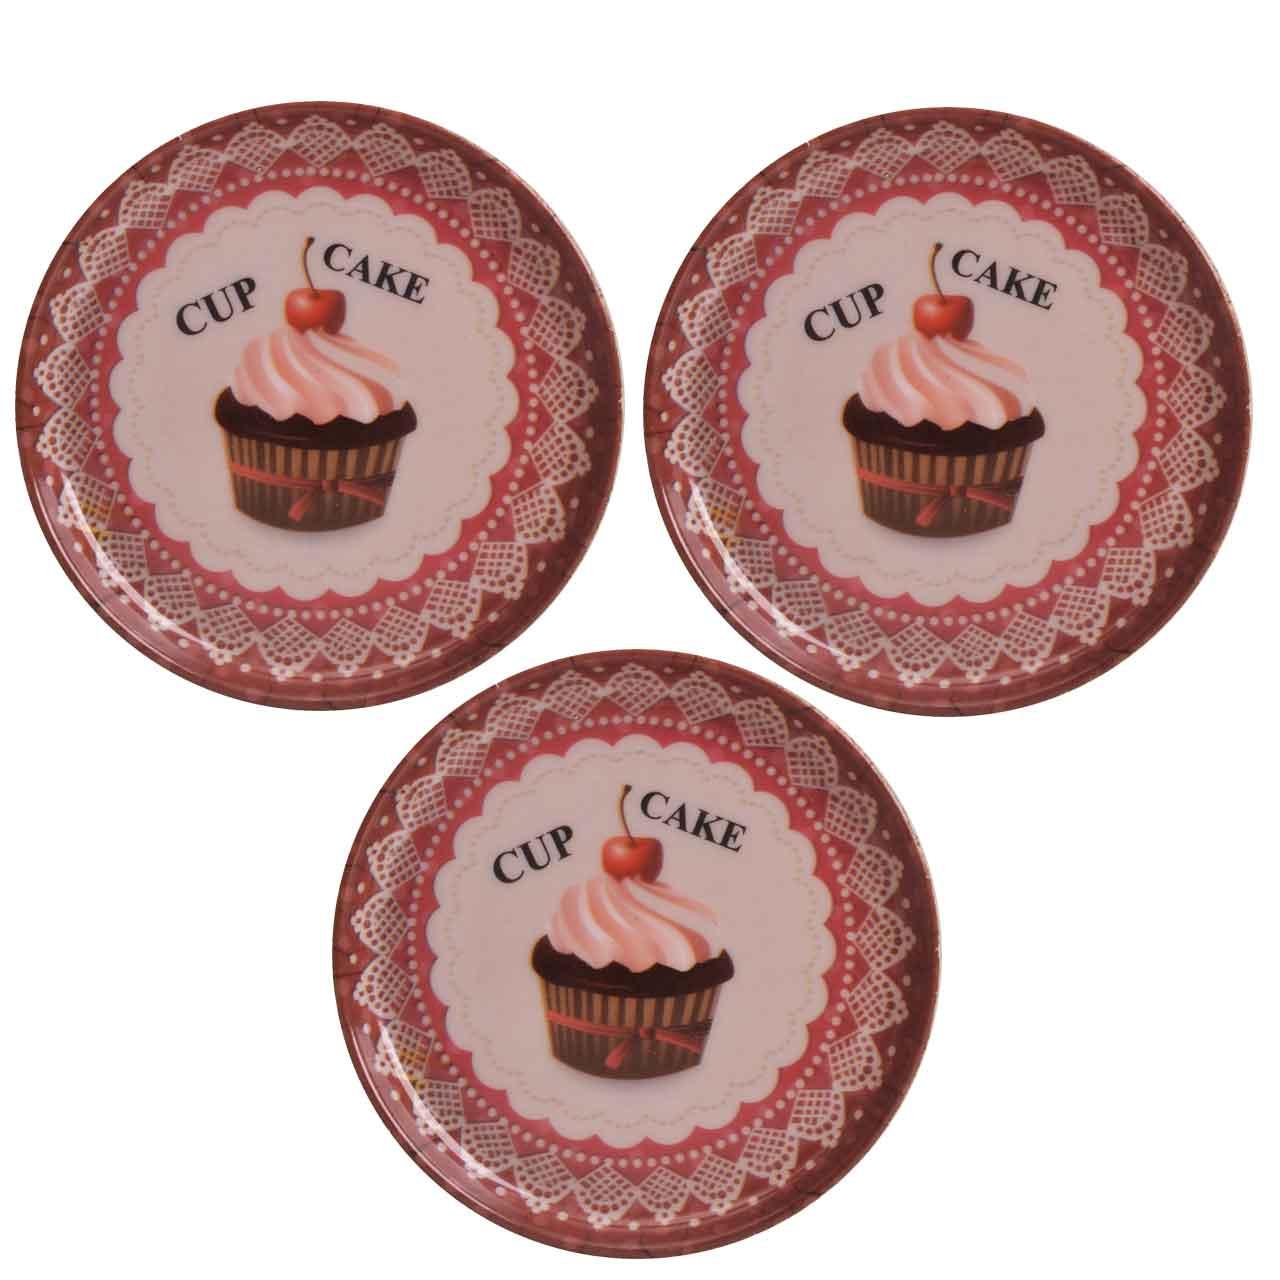 عکس زیر لیوانی مهروز طرح کاپ کیک کد 7764 بسته 3 عددی